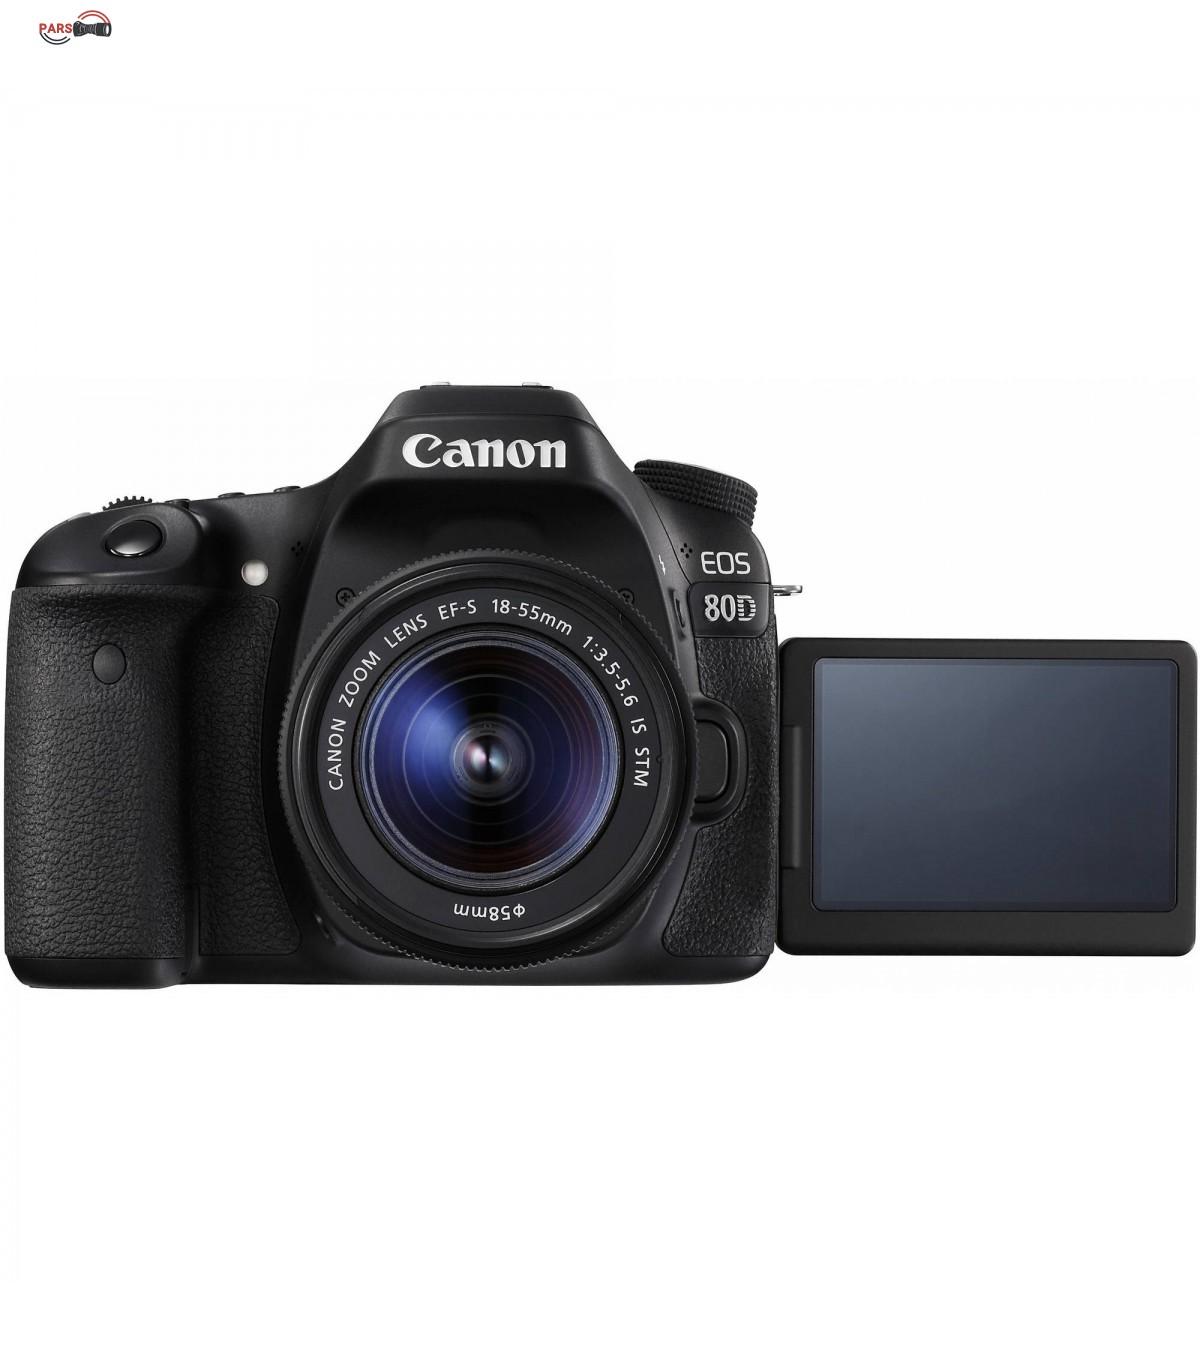 دوربین عکاسی کانن مدل Eos 80D به همراه لنز 18-55mm